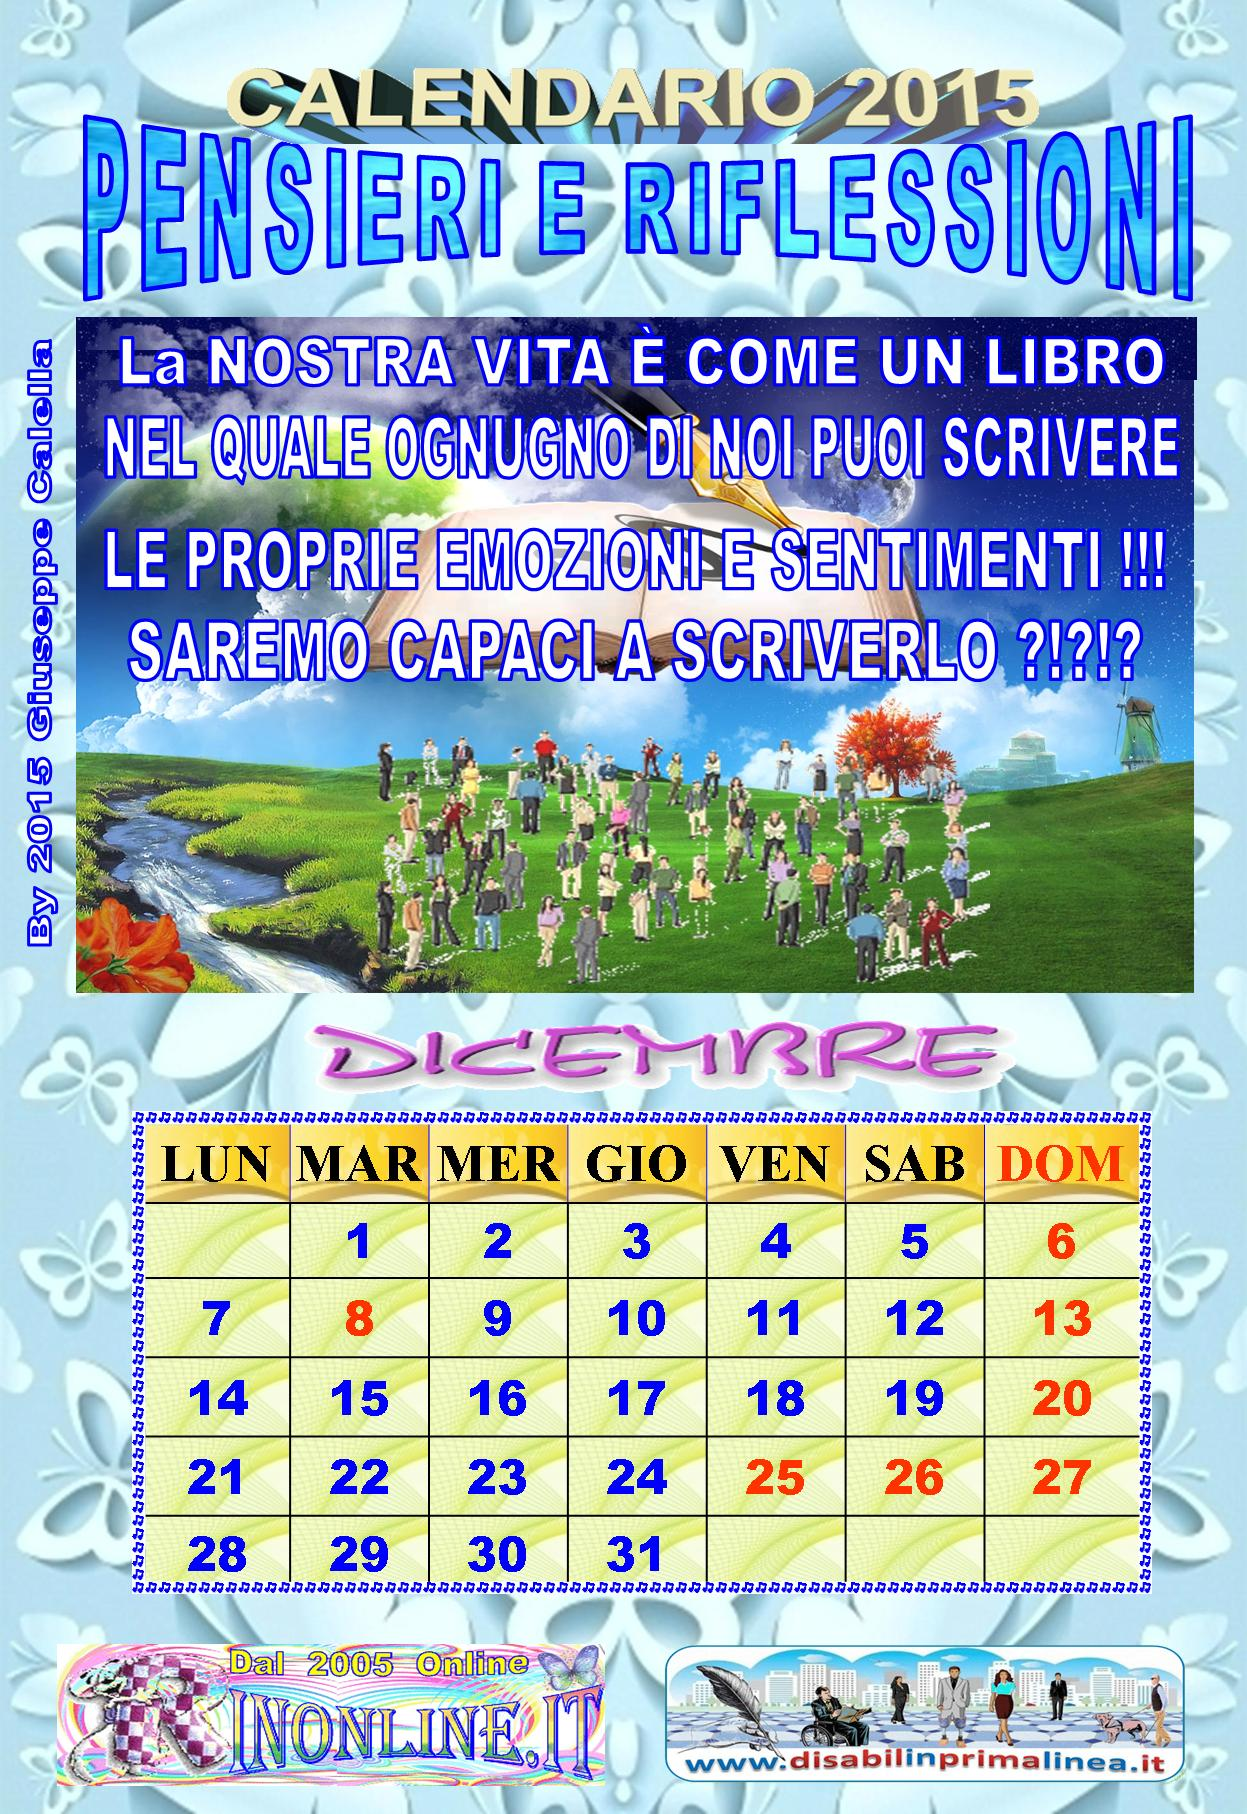 dicembre_calendario_2015_pensieri_riflessioni_giuseppe_calella